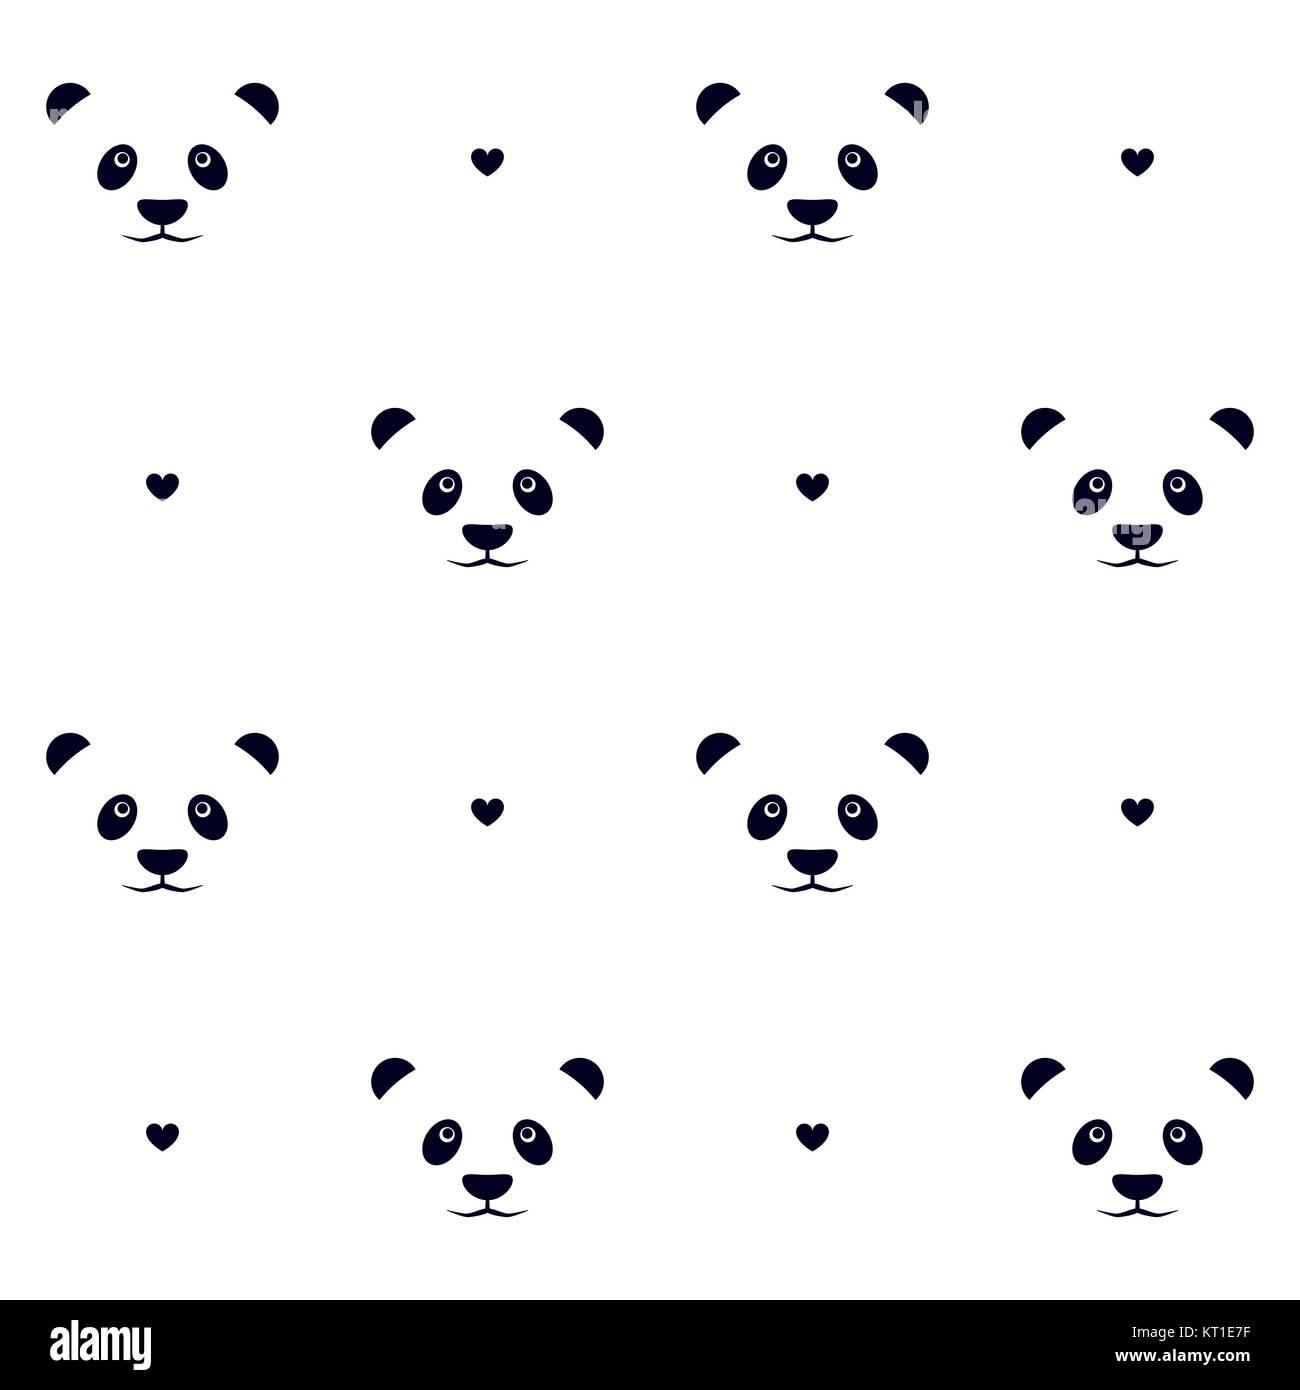 Panda Wallpaper Imágenes De Stock & Panda Wallpaper Fotos De Stock ...